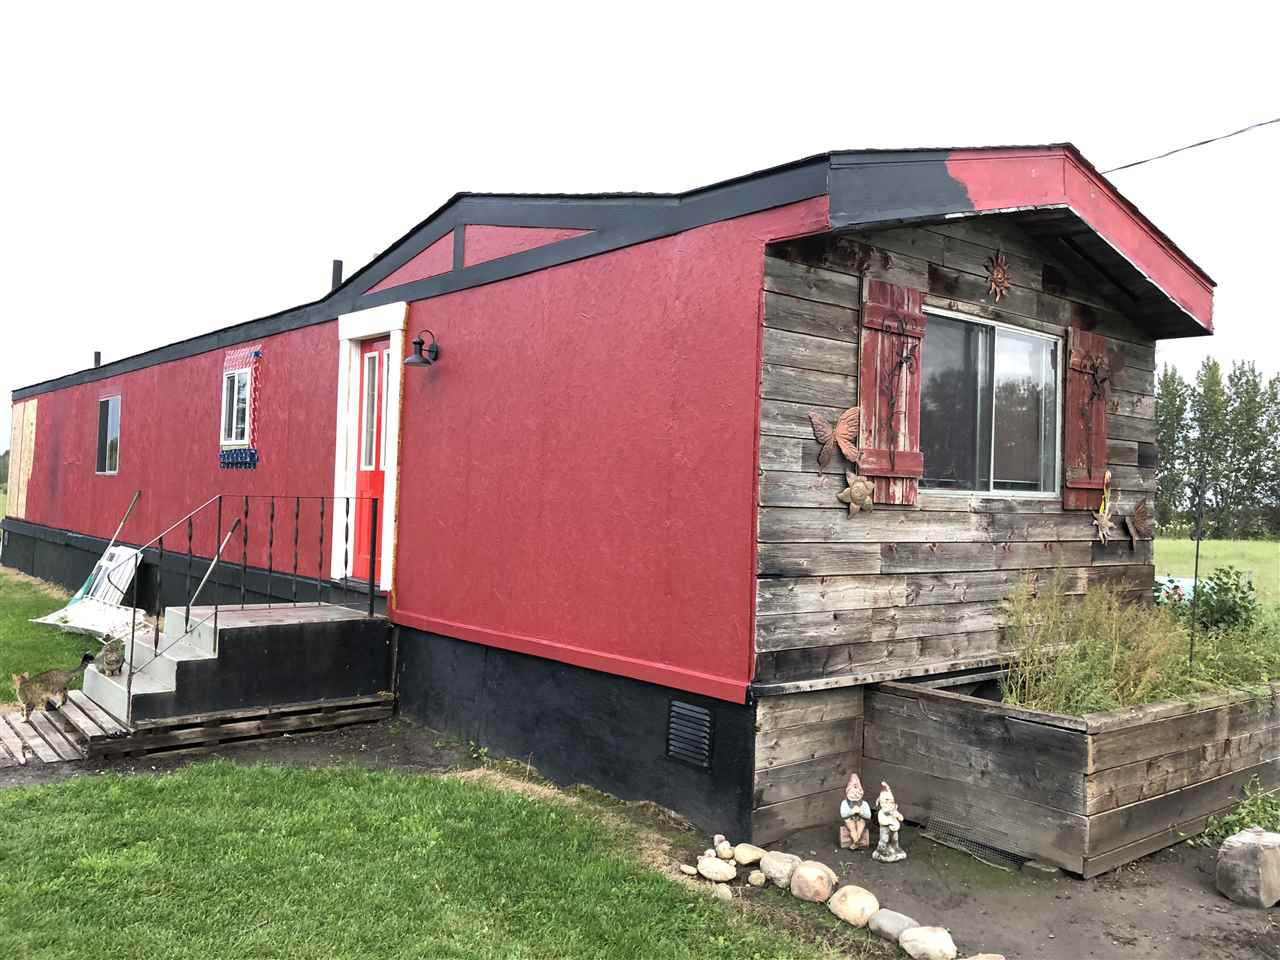 Main Photo: 63303 RANGE ROAD 271: Rural Westlock County House for sale : MLS®# E4127146